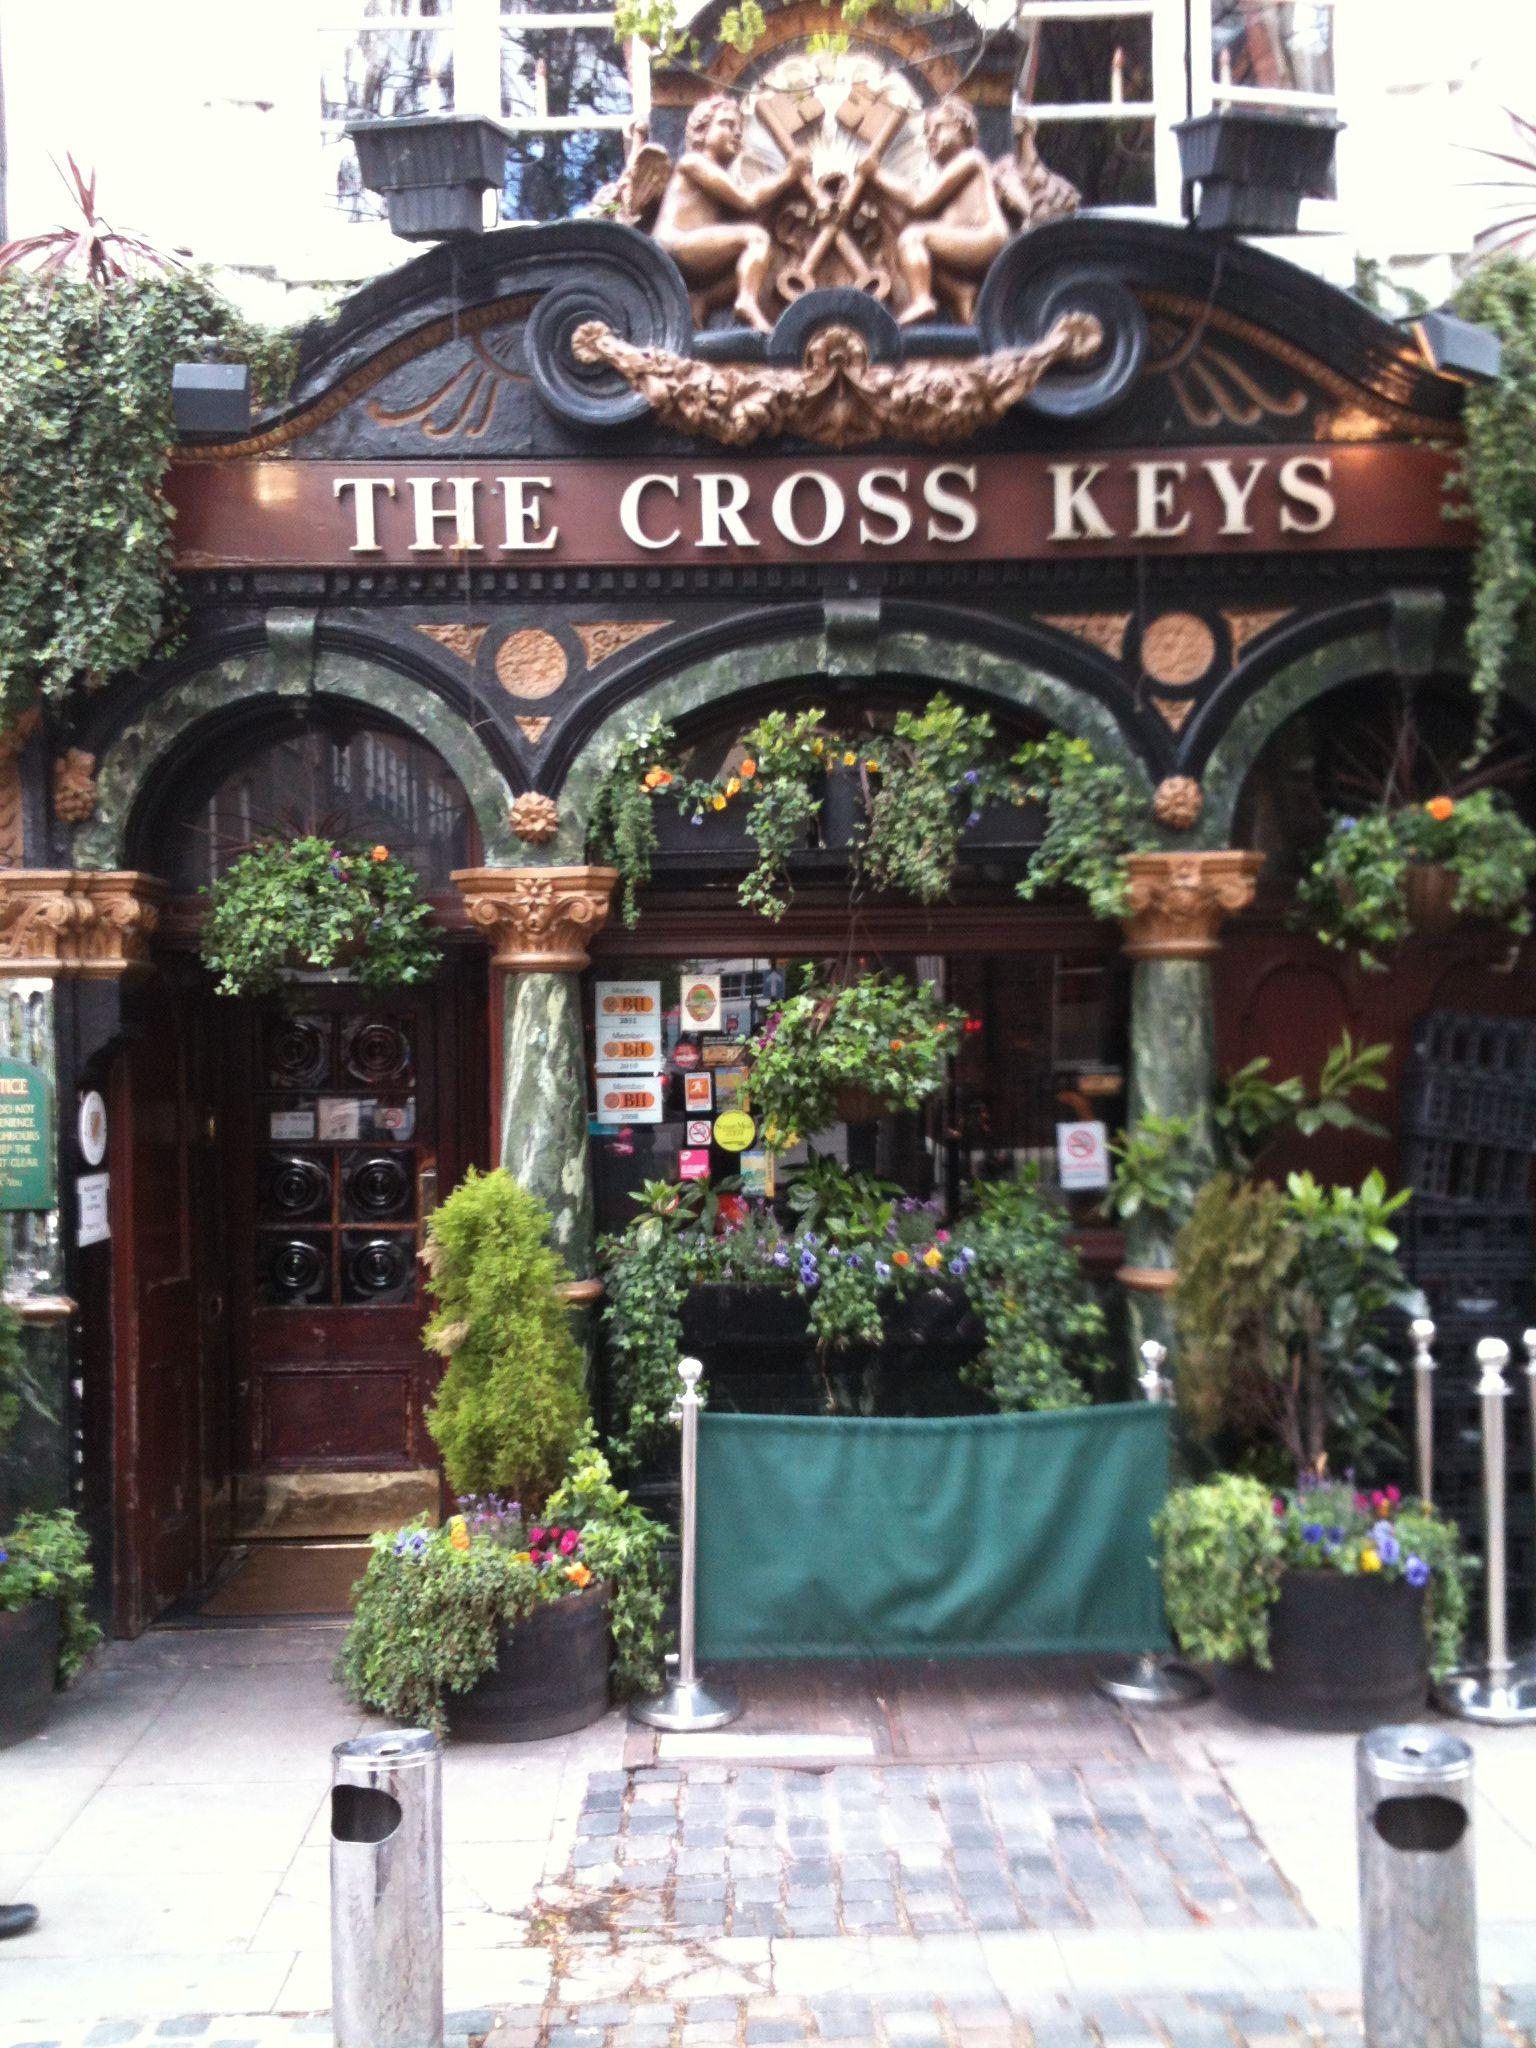 The Cross Keys pub in Covent Garden, looks like it's from